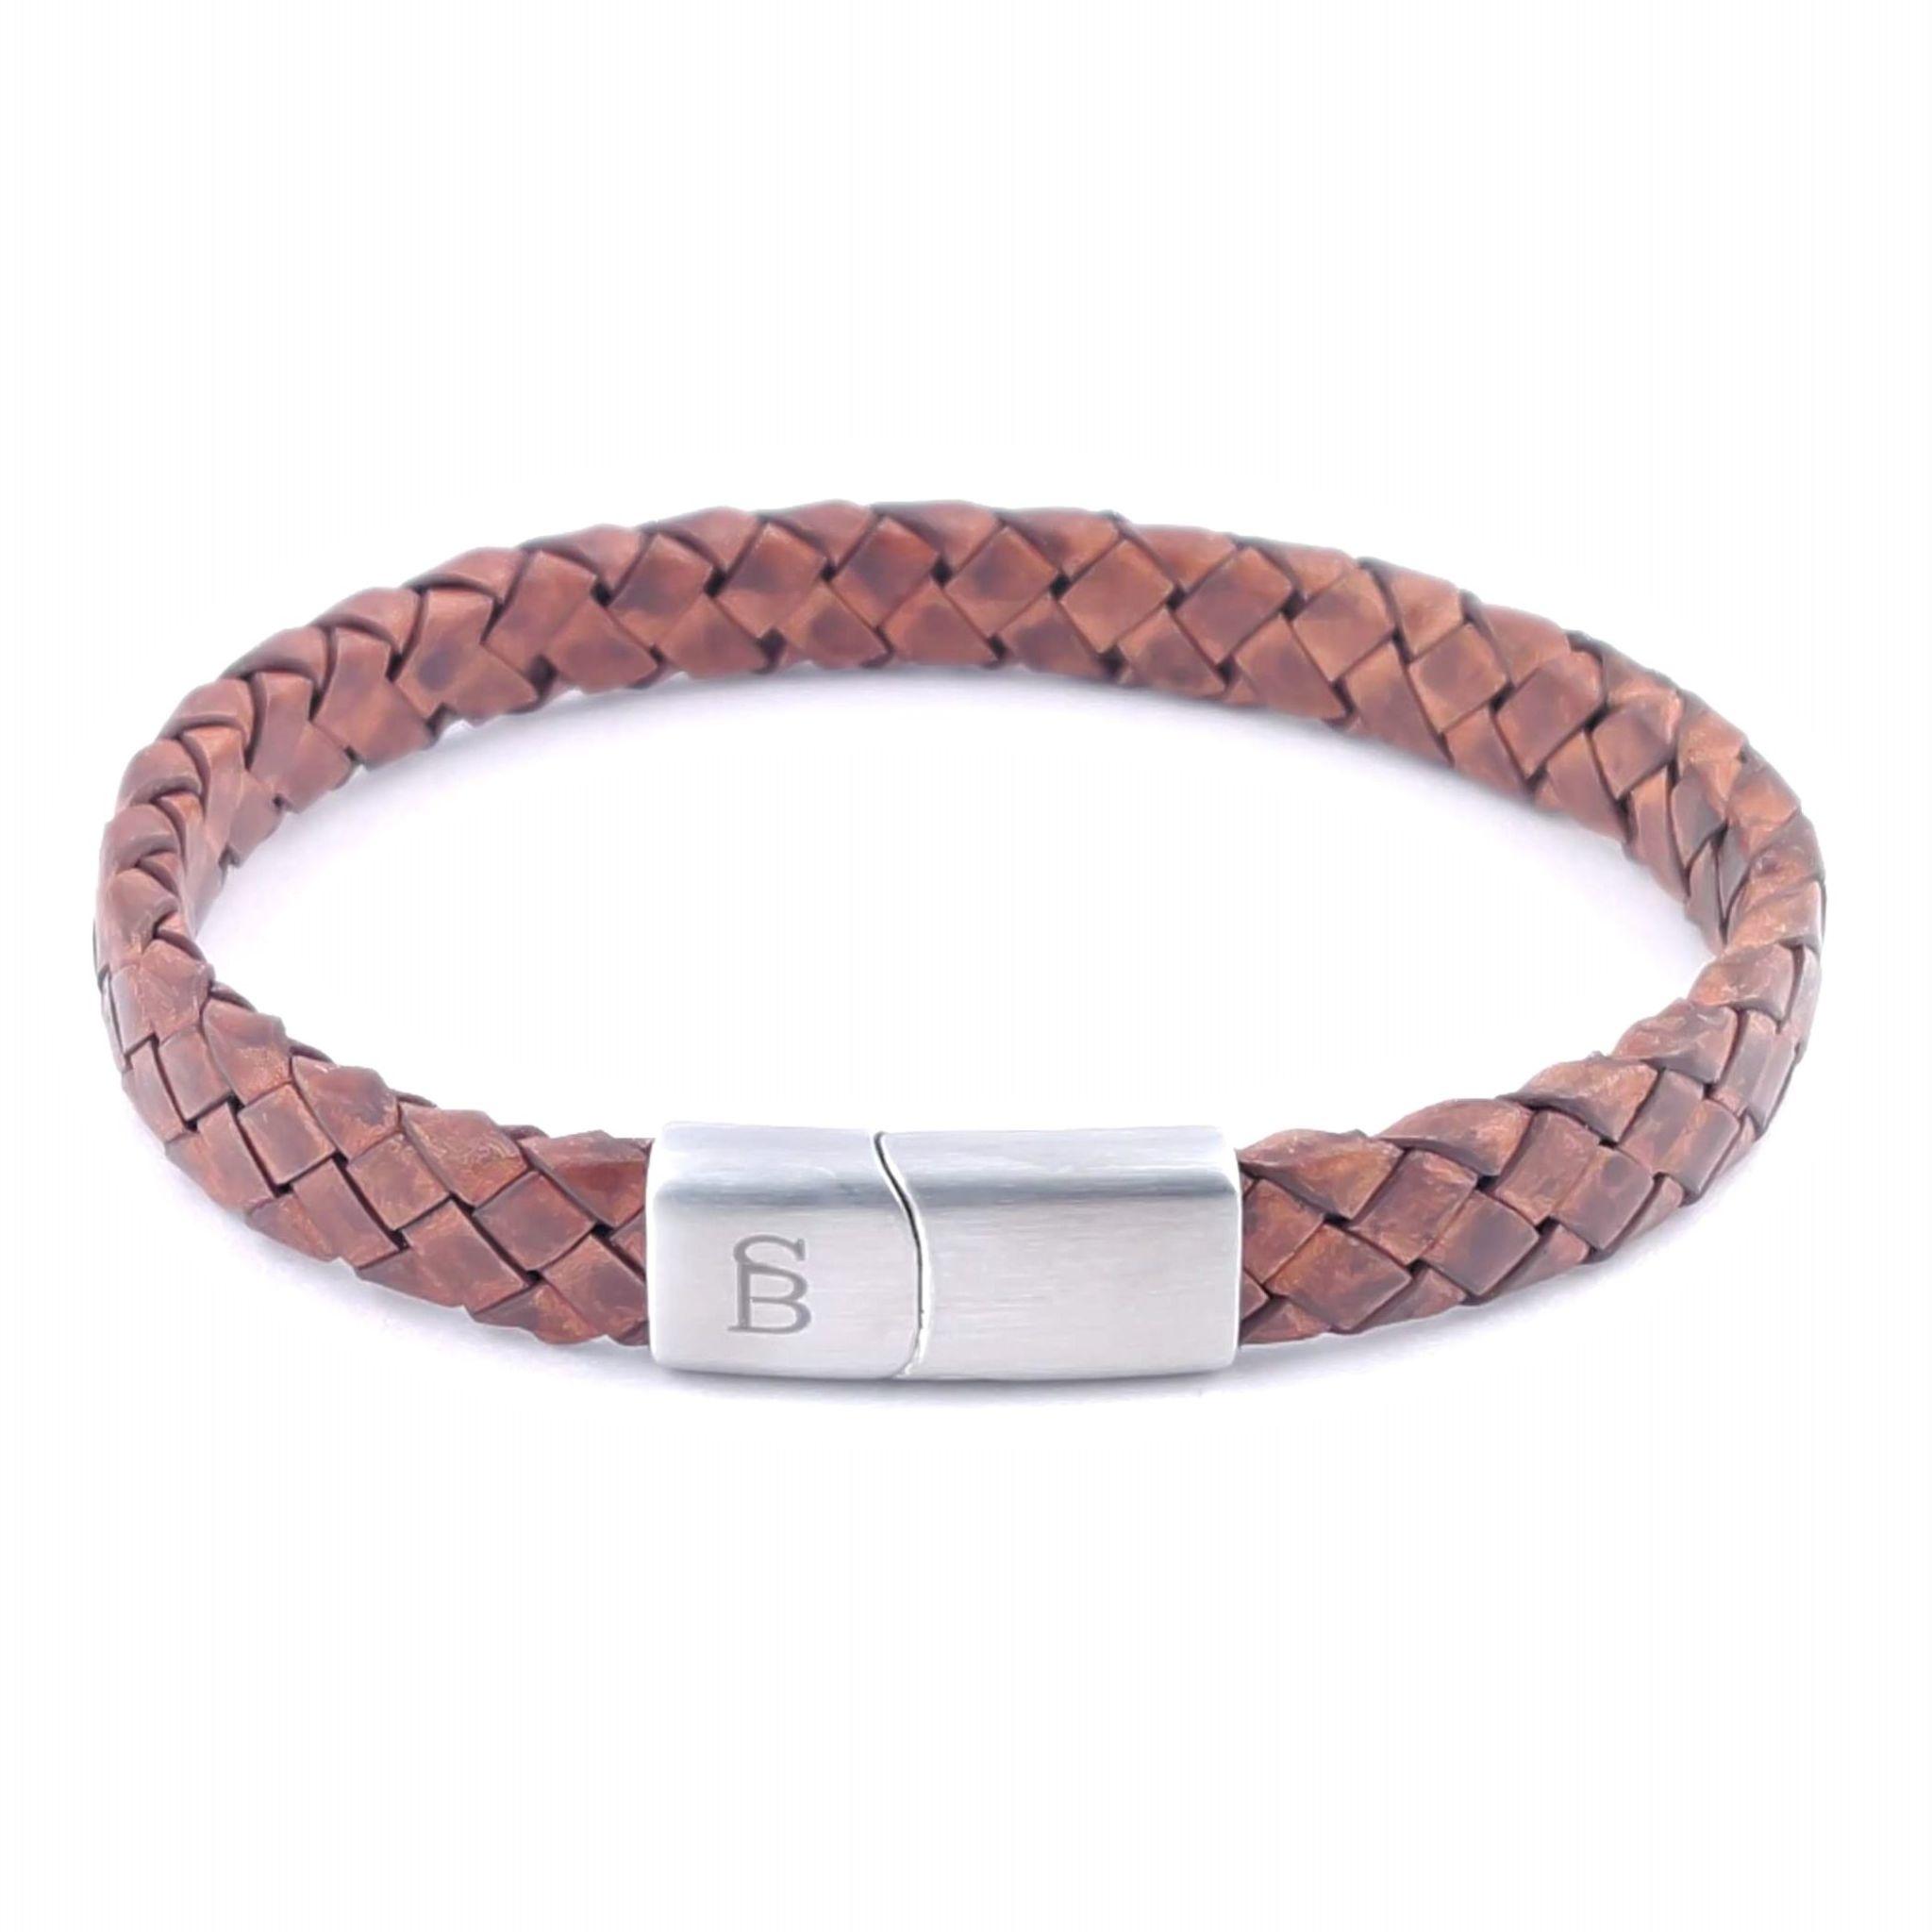 Steel & Barnett Leather bracelet Riley - Caramel - Size S